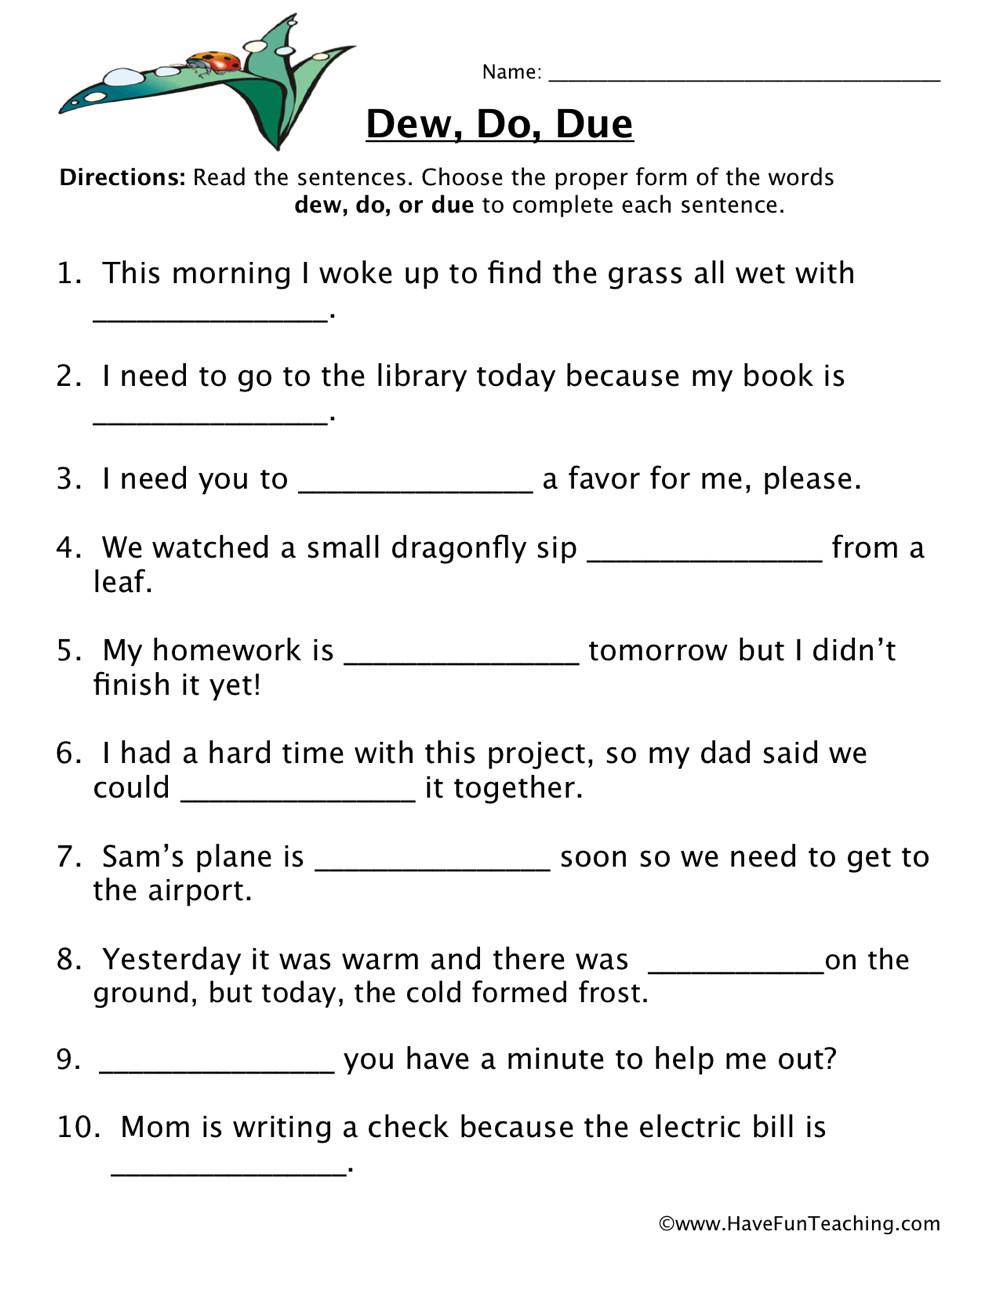 Homophone Worksheet 4th Grade Dew Do Due Homophones Worksheet